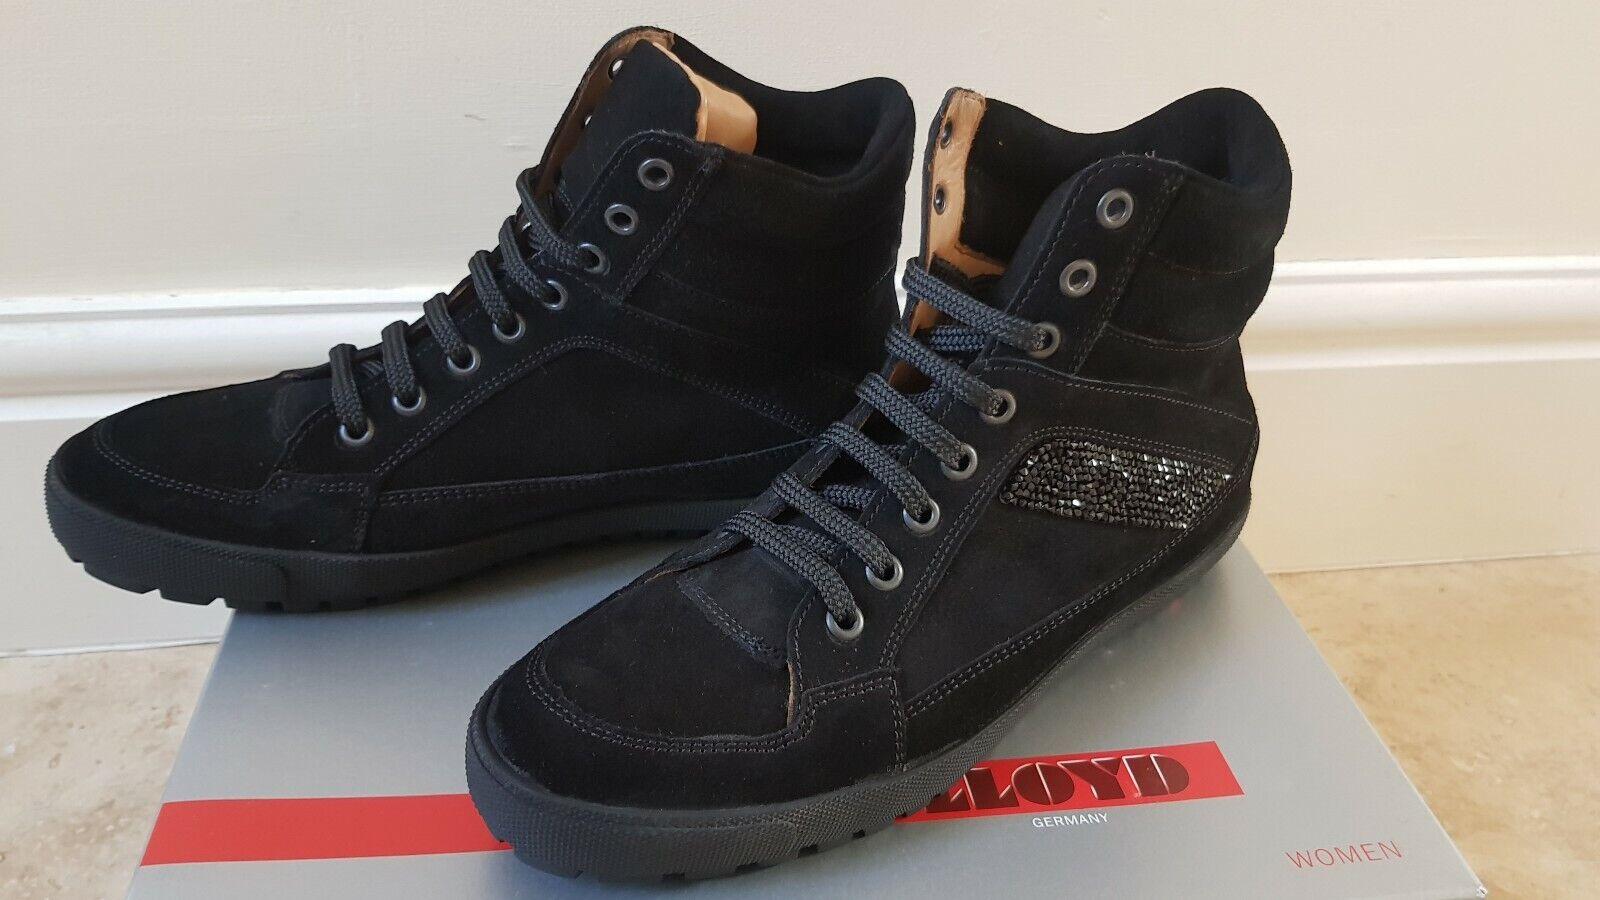 Lloyd Gamuza Cuero Negro botas al Tobillo Hi Tops UK5 parte superior  Cuero interior  Cuero